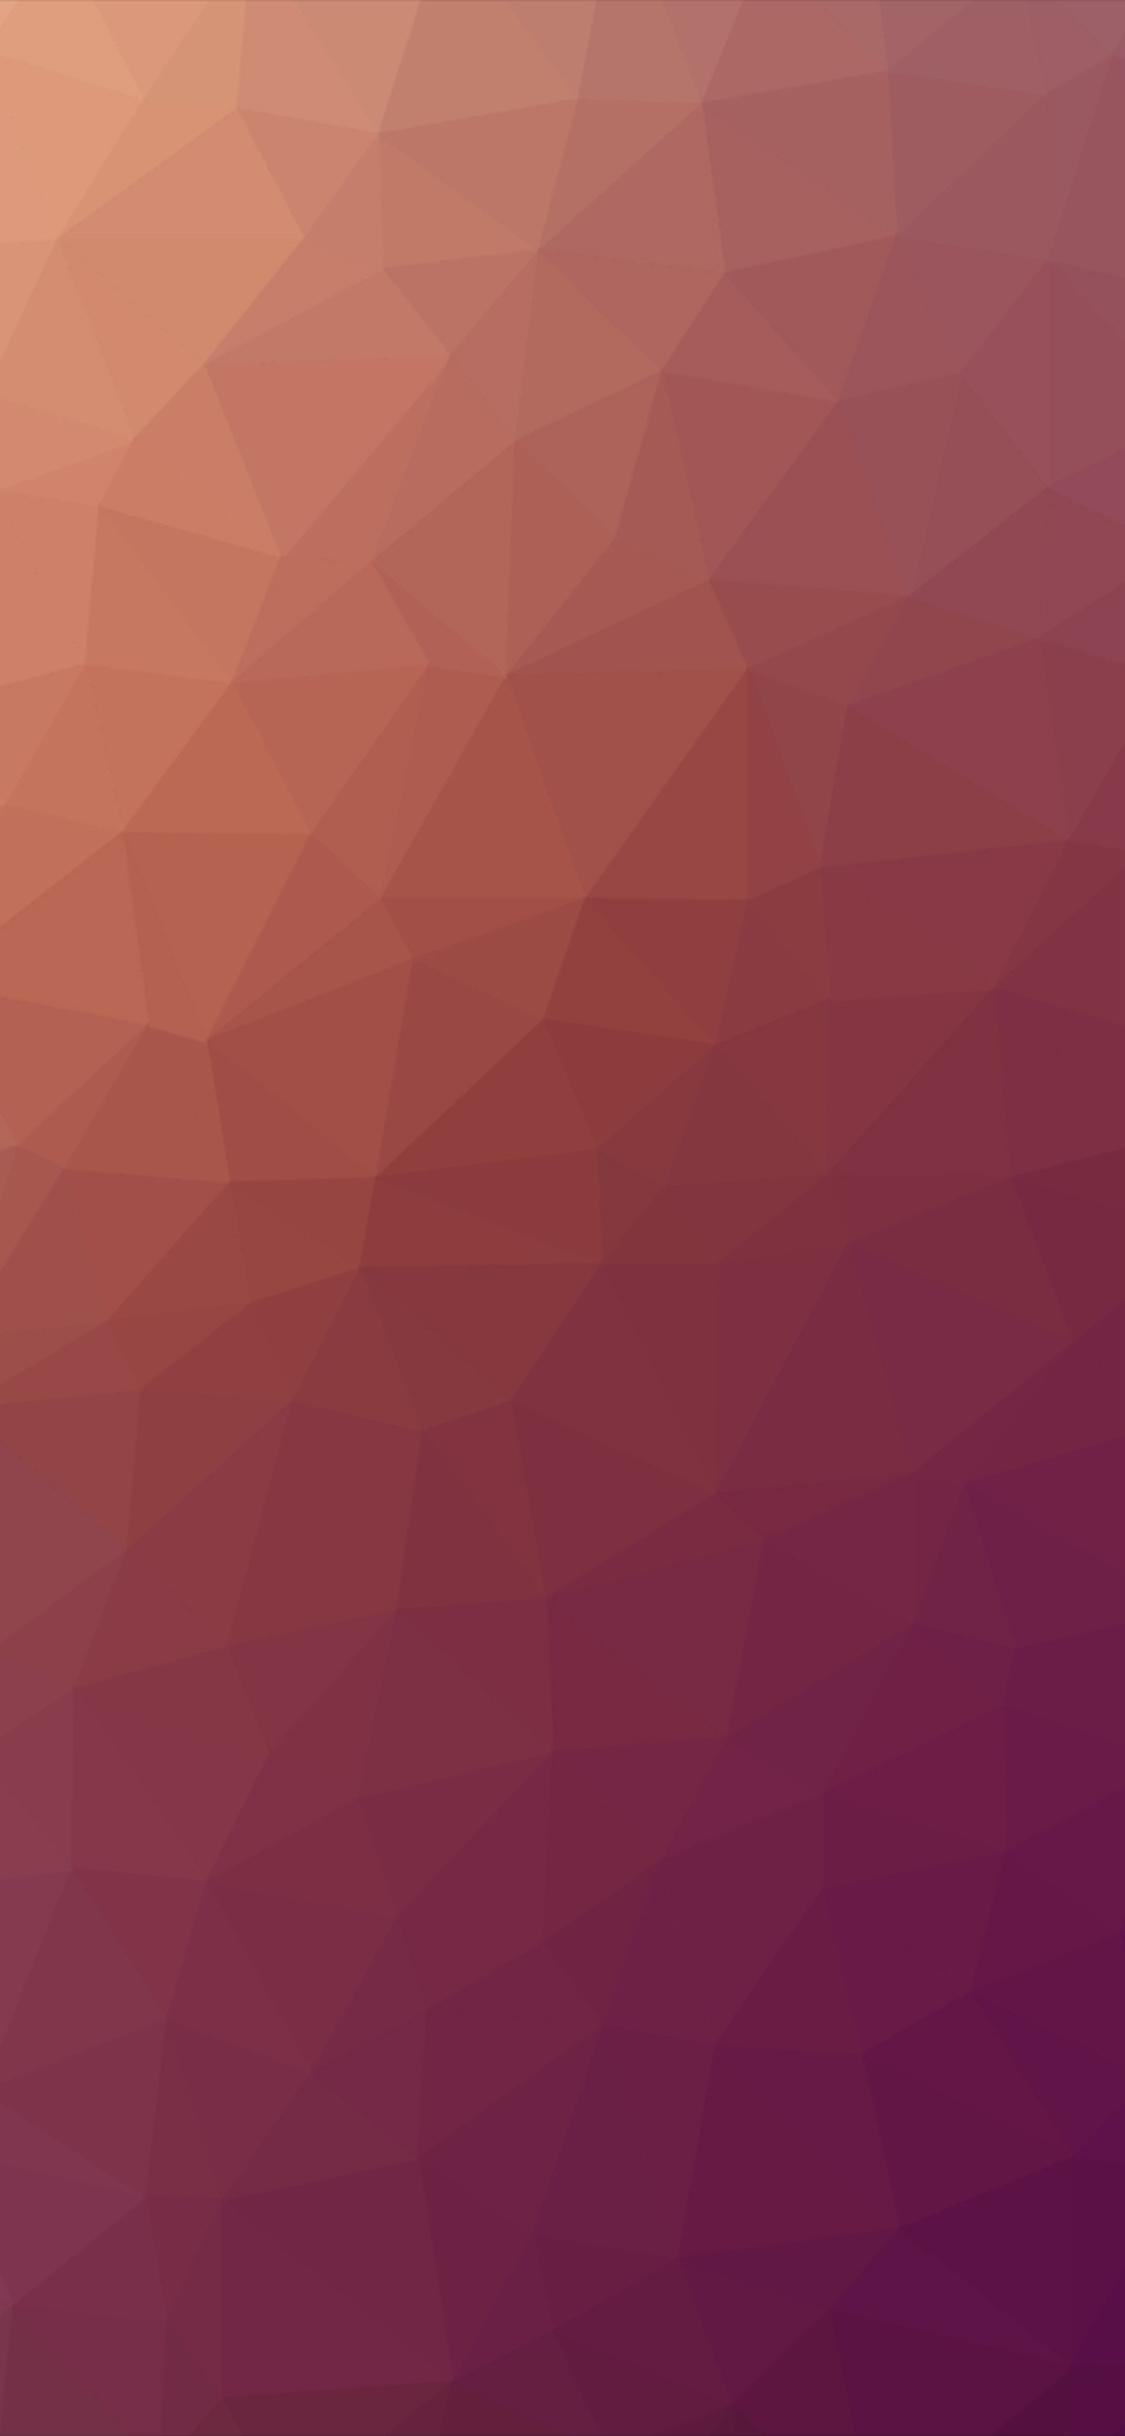 Iphonexpapers Com Apple Iphone Wallpaper Vm28 Poly Art